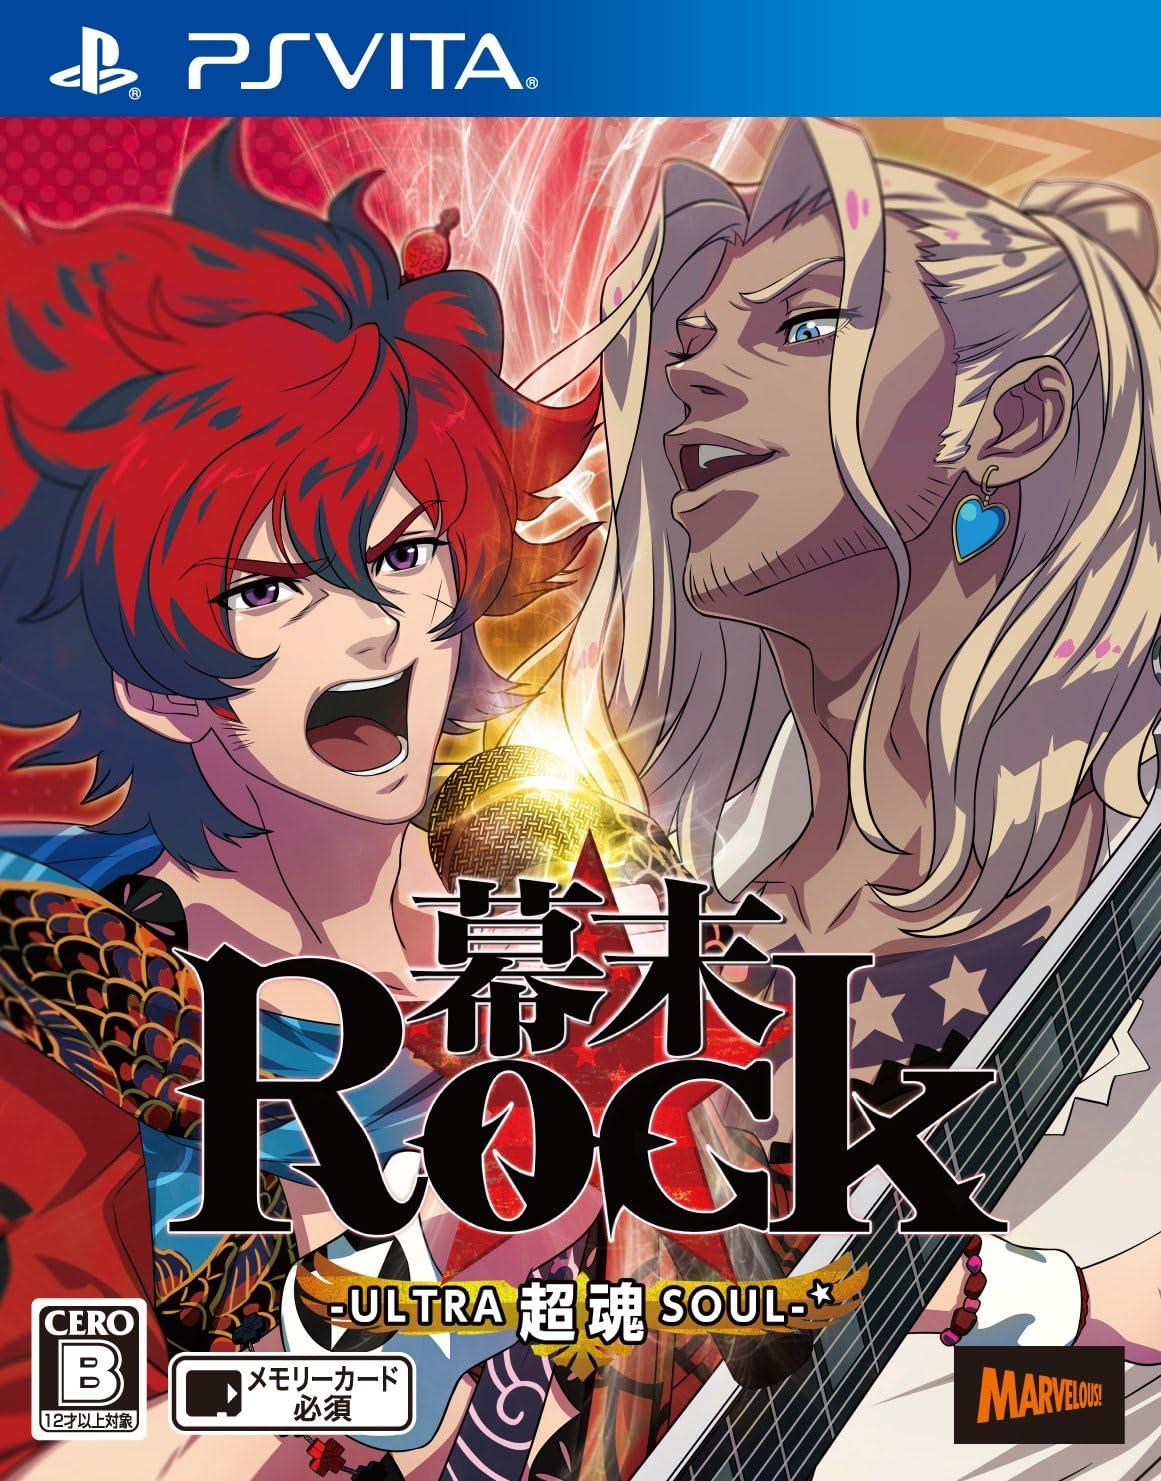 Amazon 幕末rock 超魂 Ps Vita ゲーム